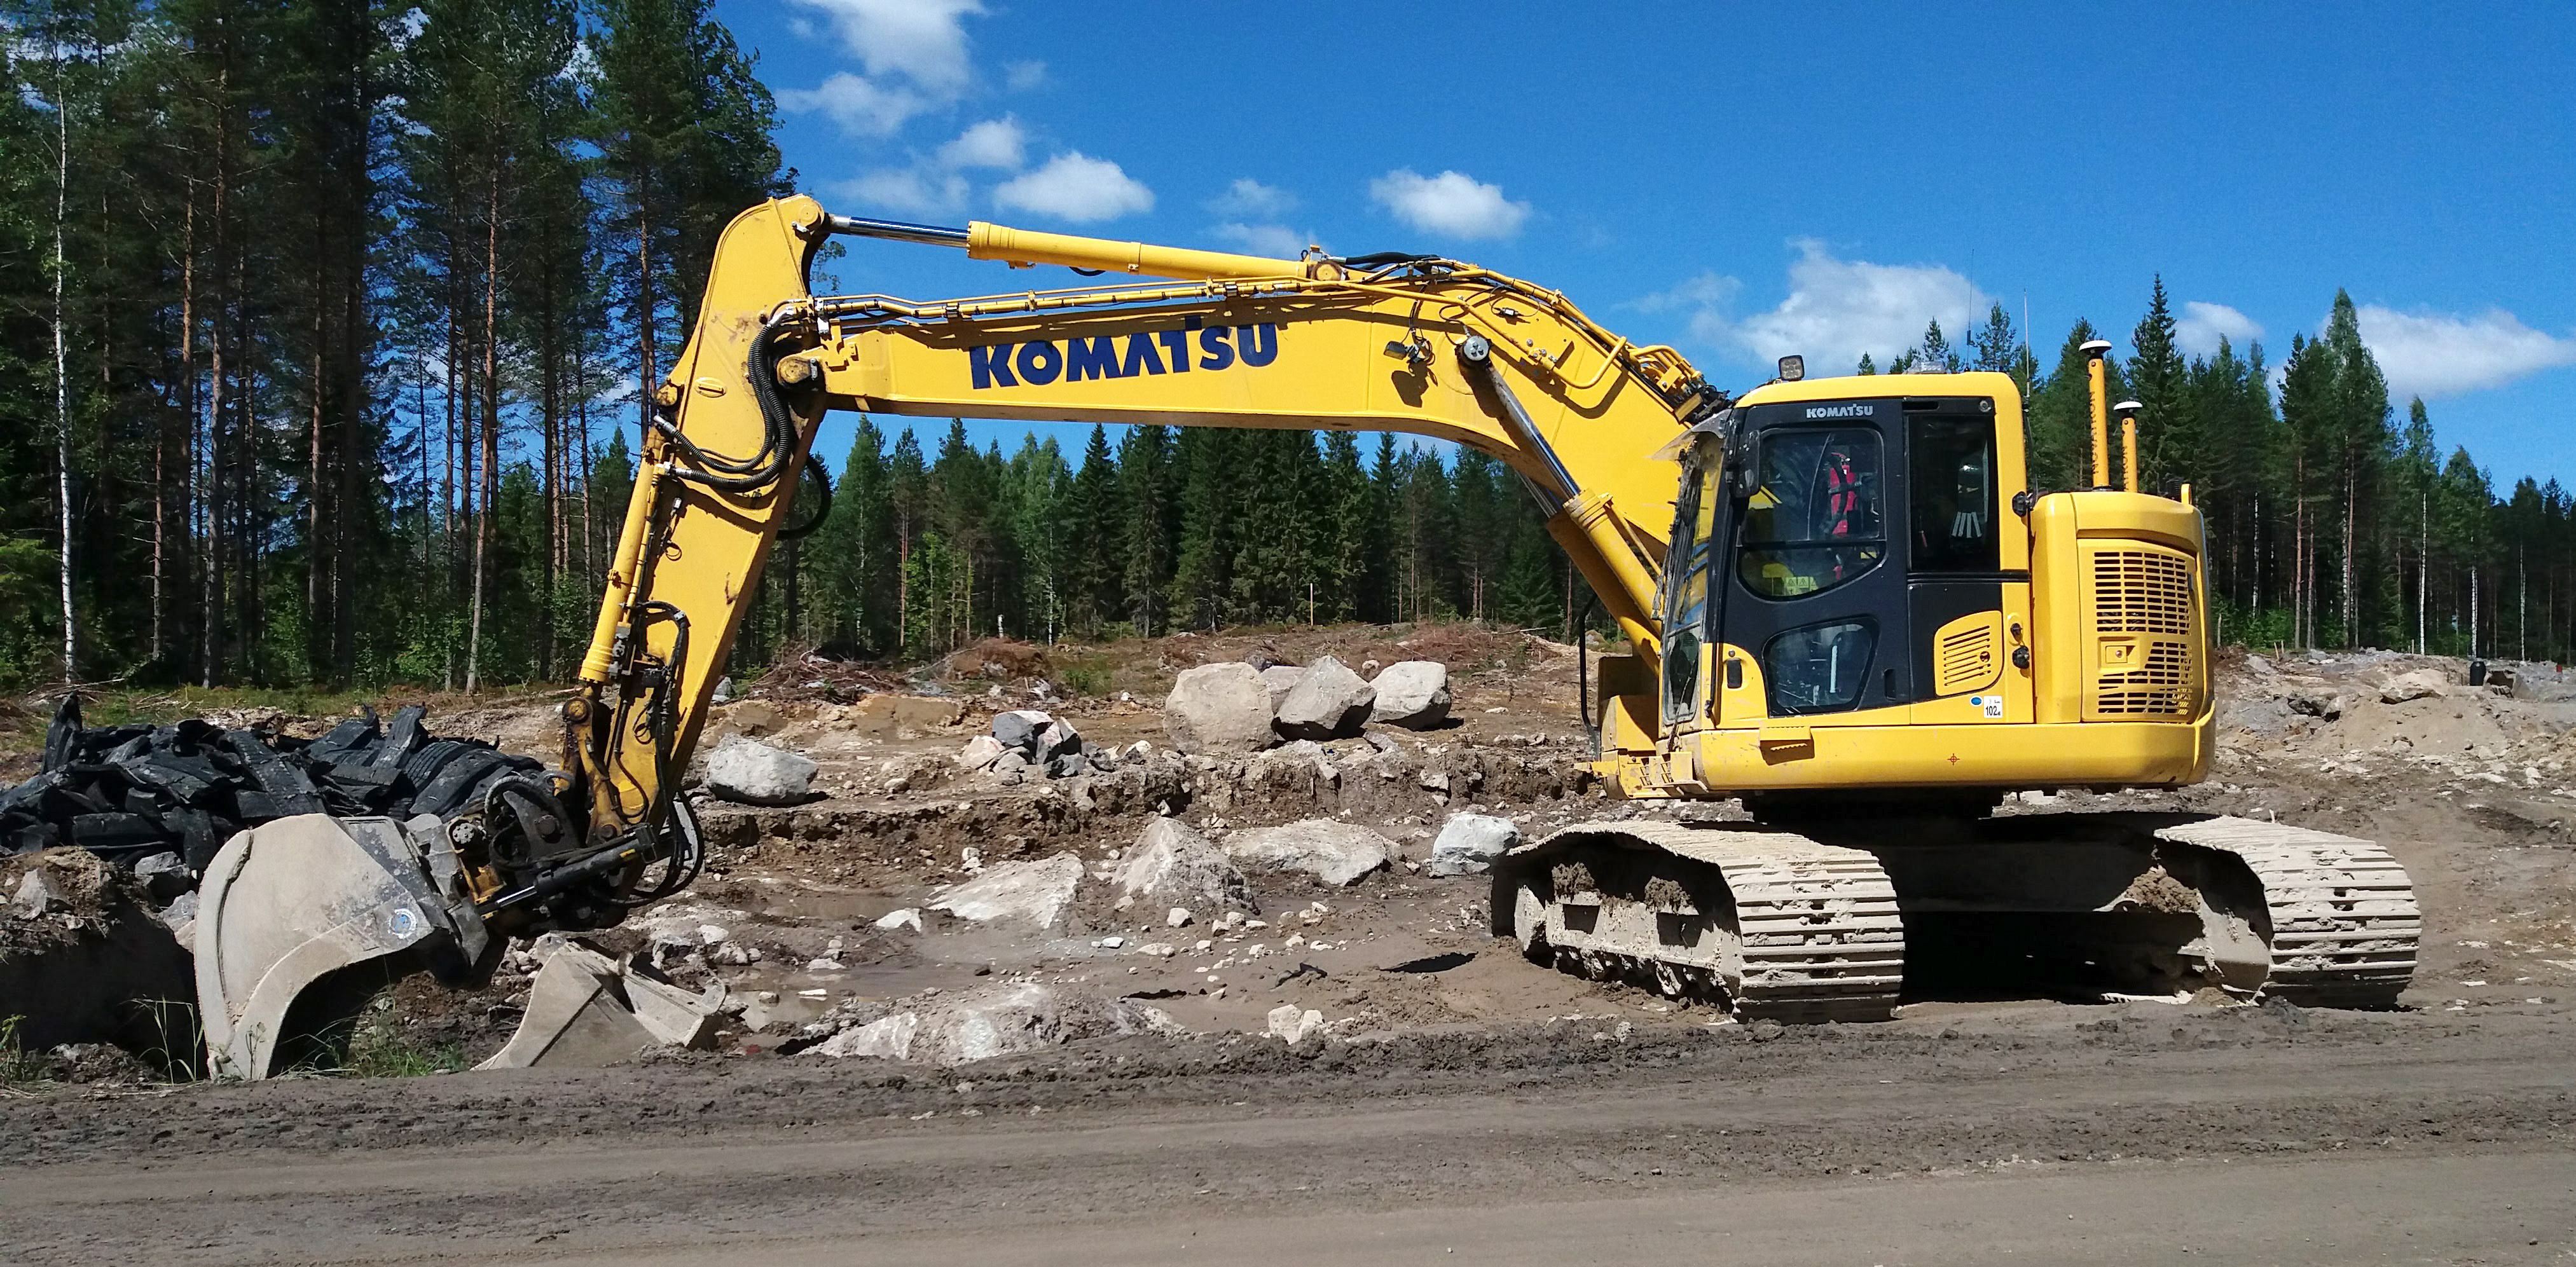 File:Komatsu excavator 2 jpg - Wikimedia Commons